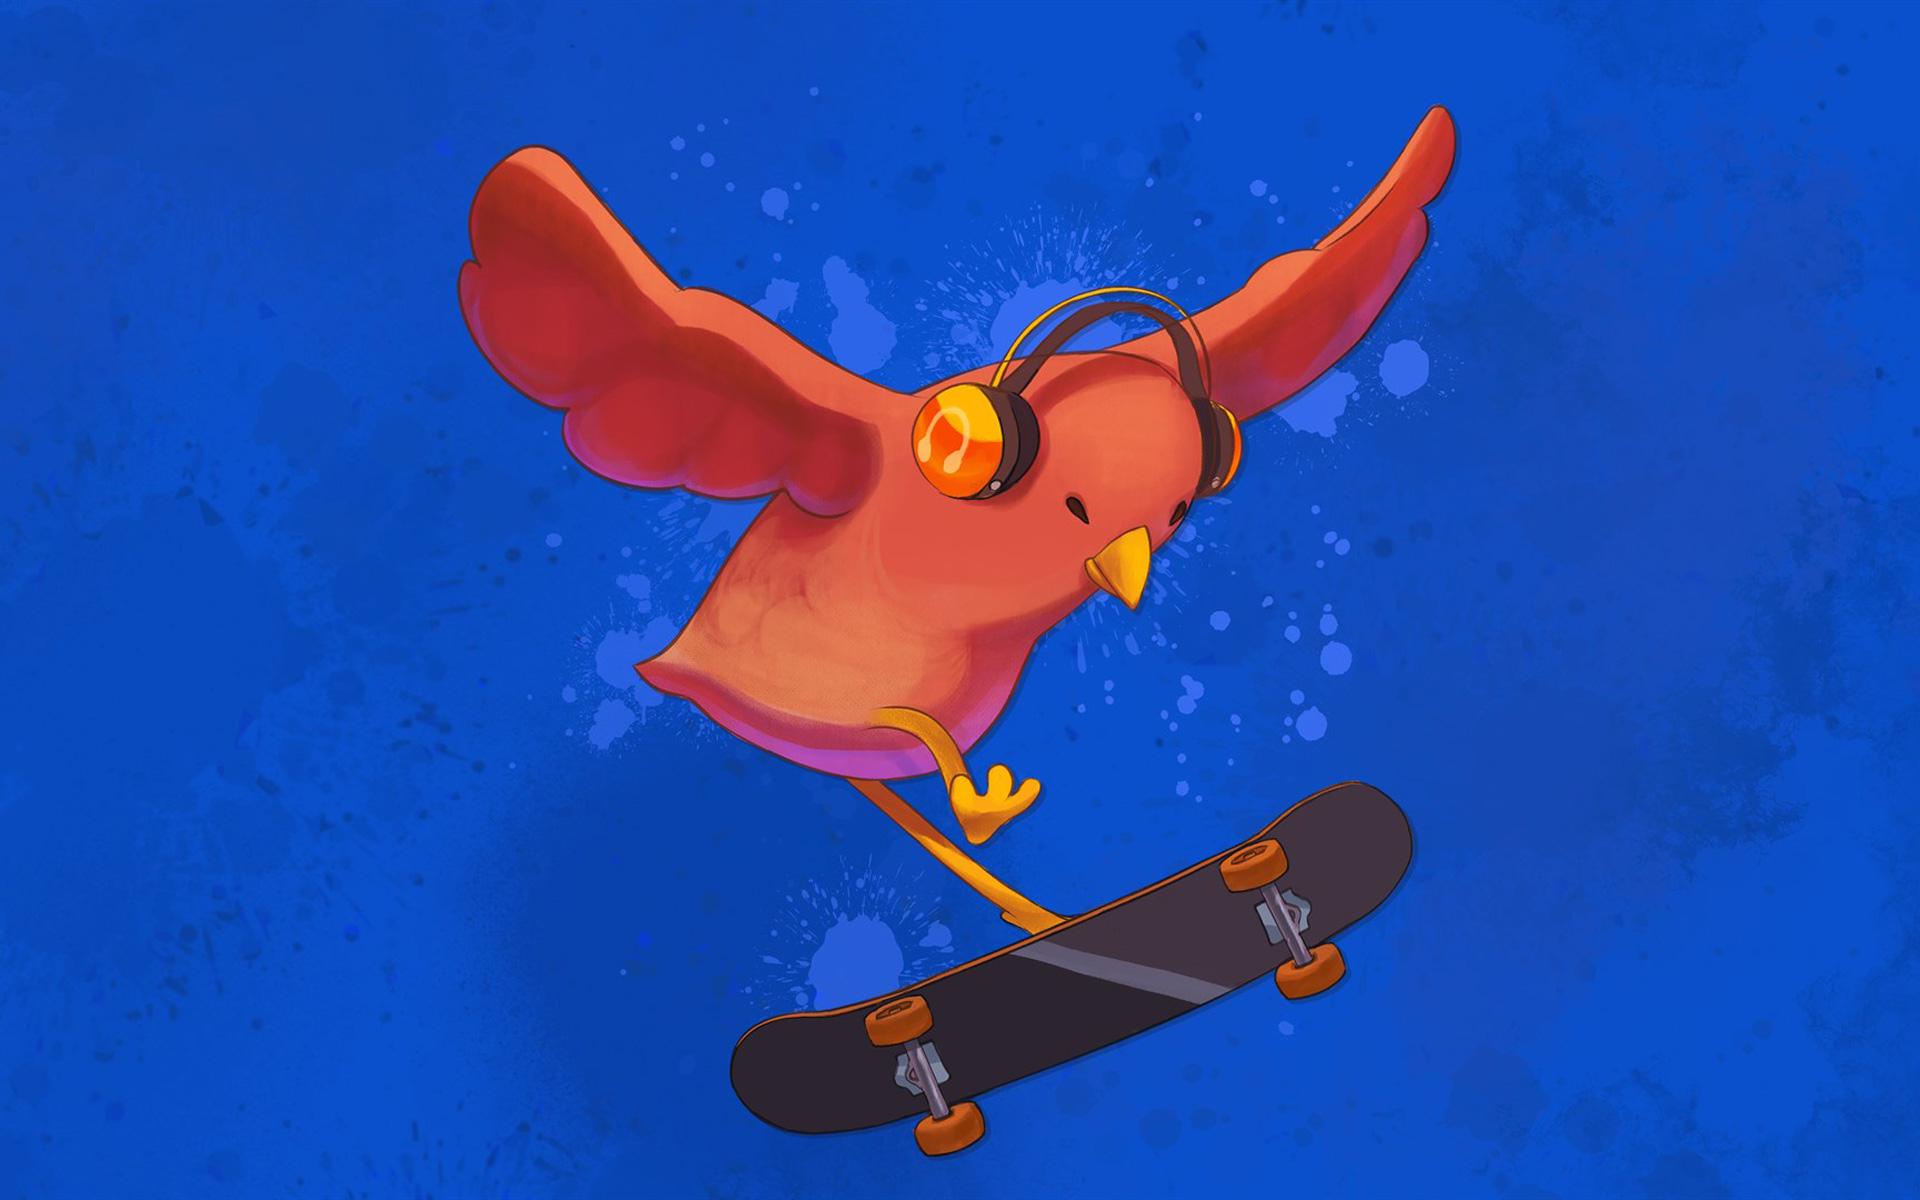 Free Skatebird Wallpaper in 1920x1200